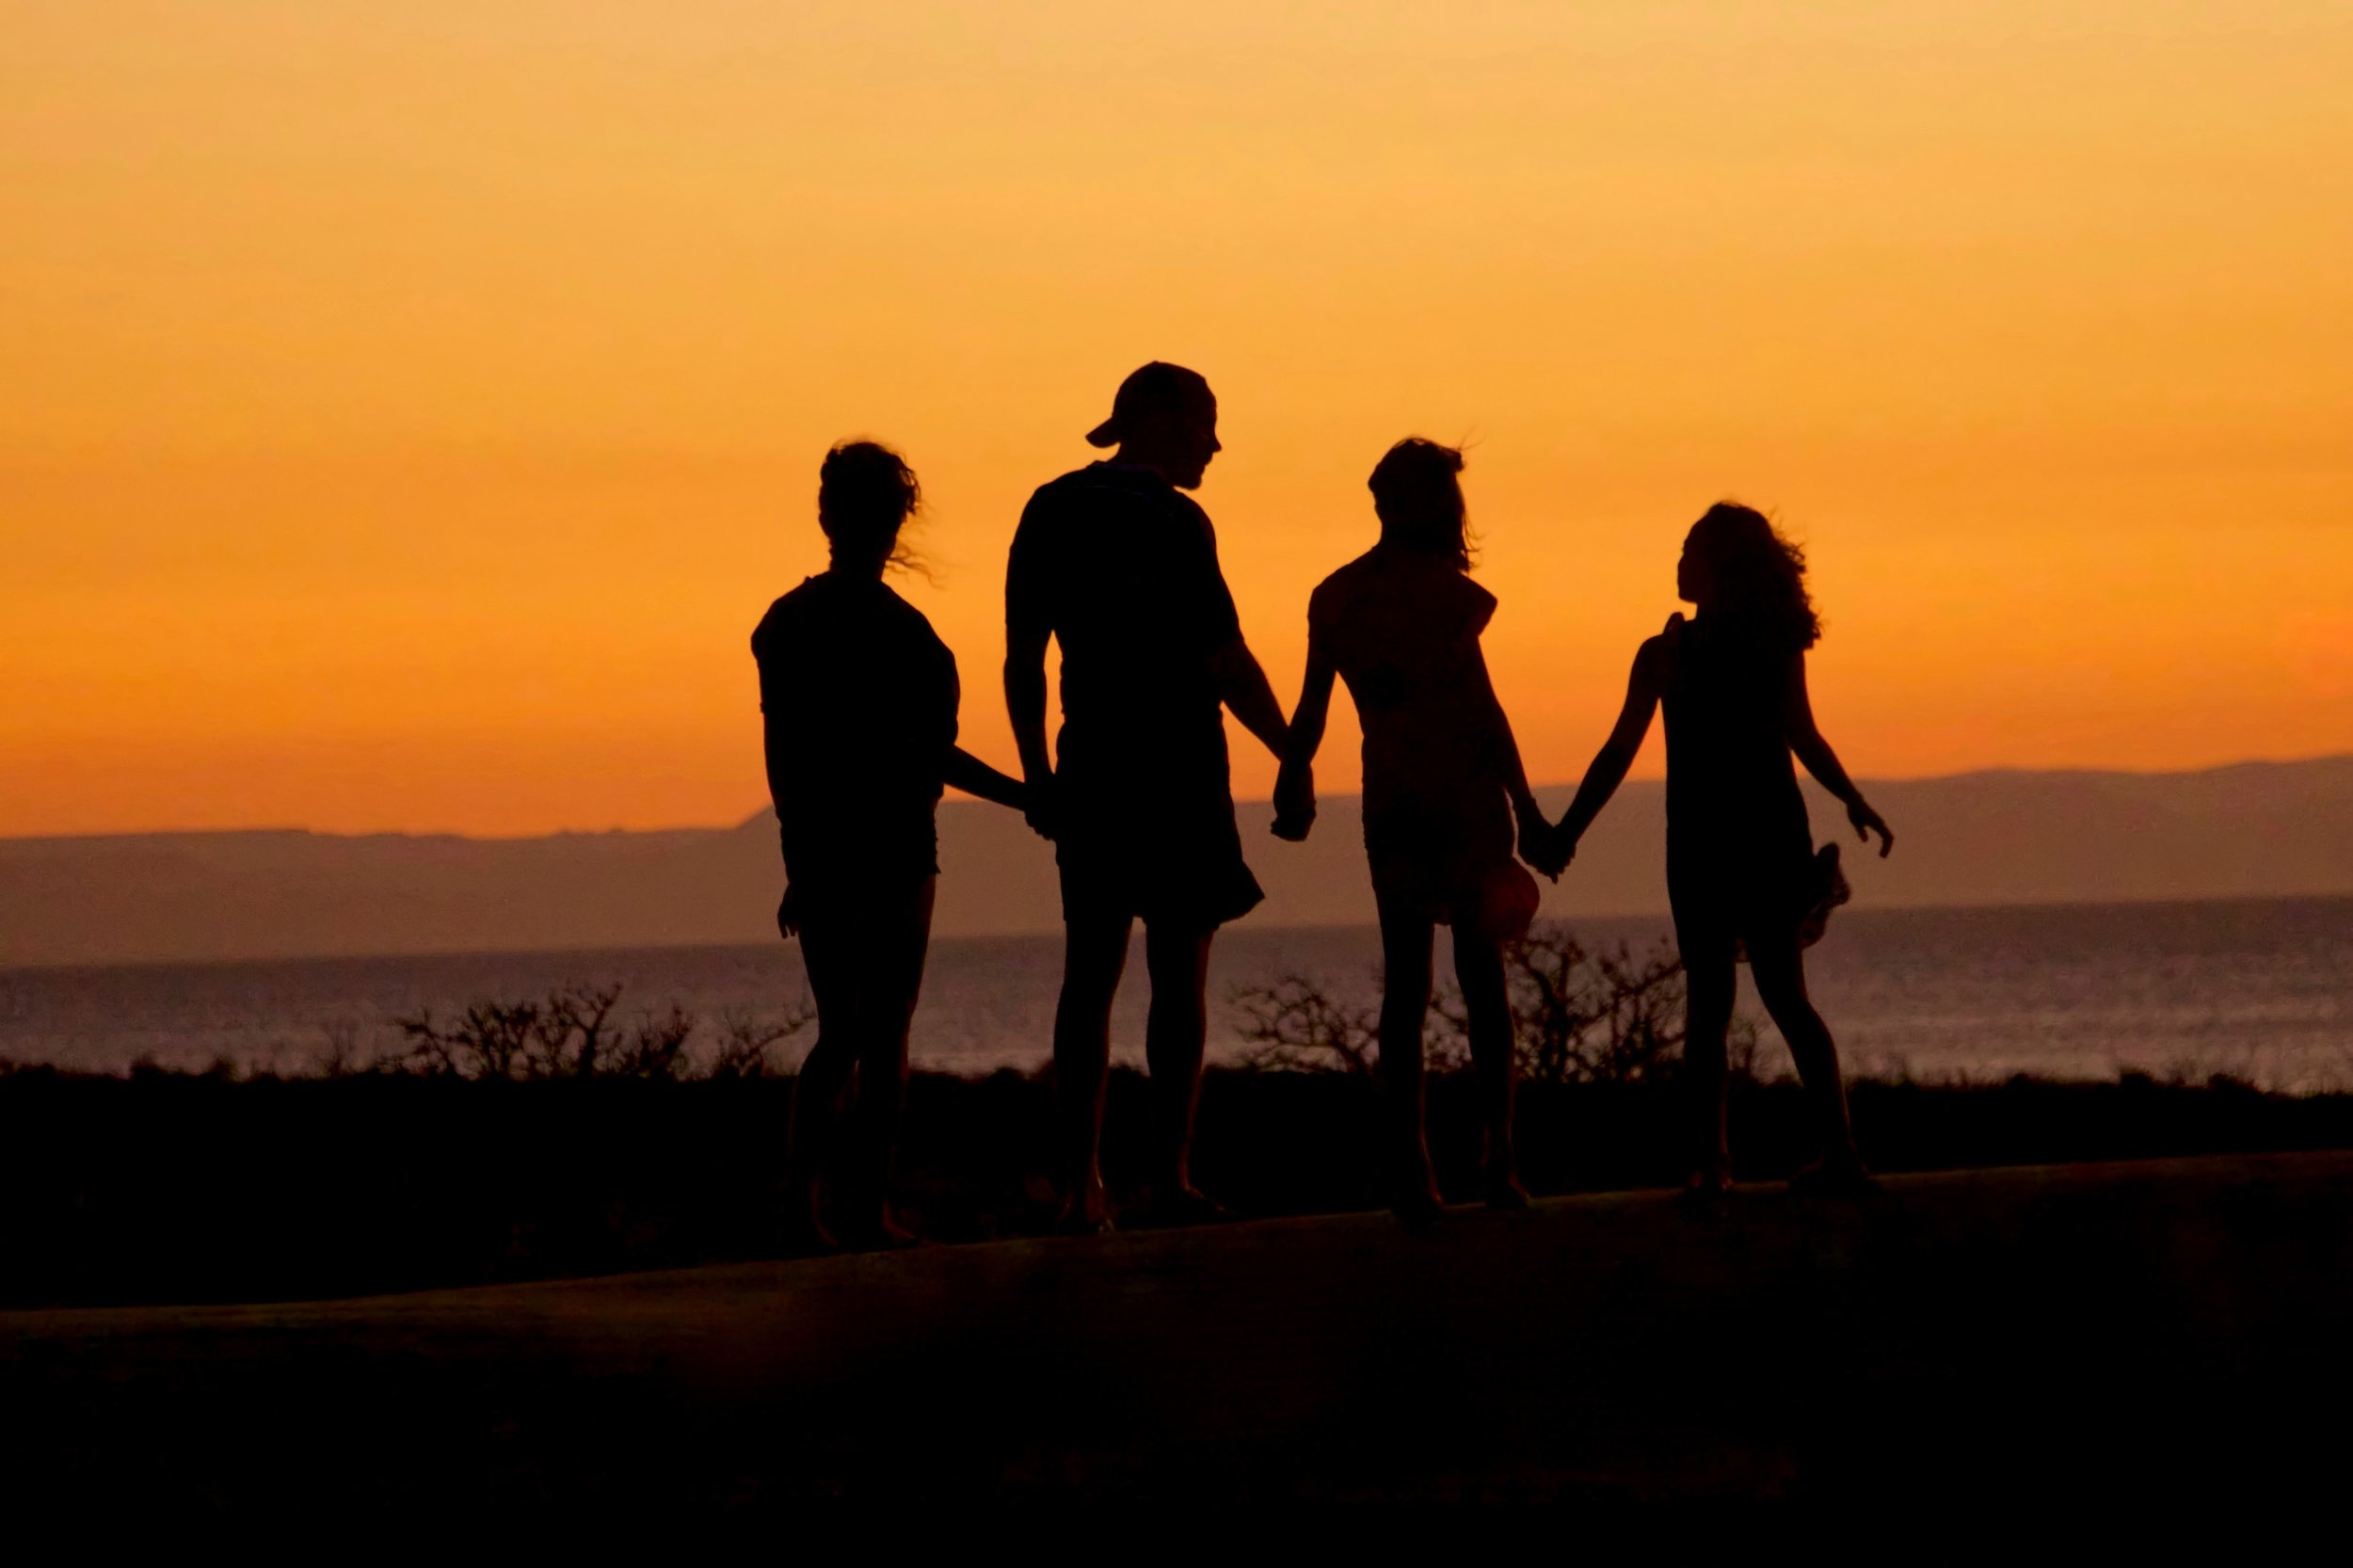 Family - Simplify life